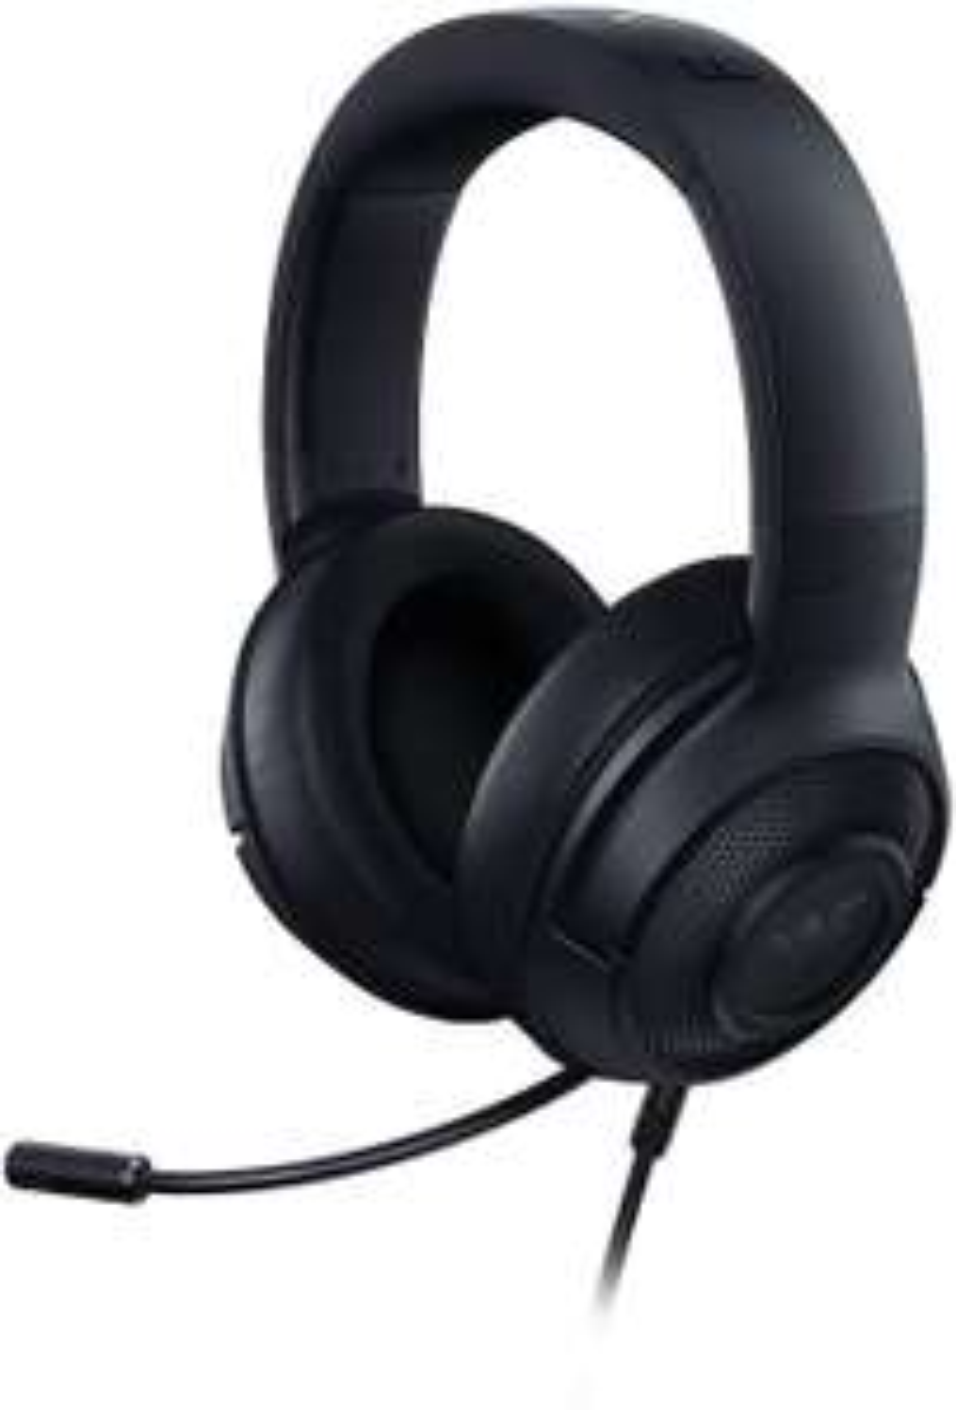 Razer Kraken X Gaming Headset schwarz [Amazon & Saturn Abholung]